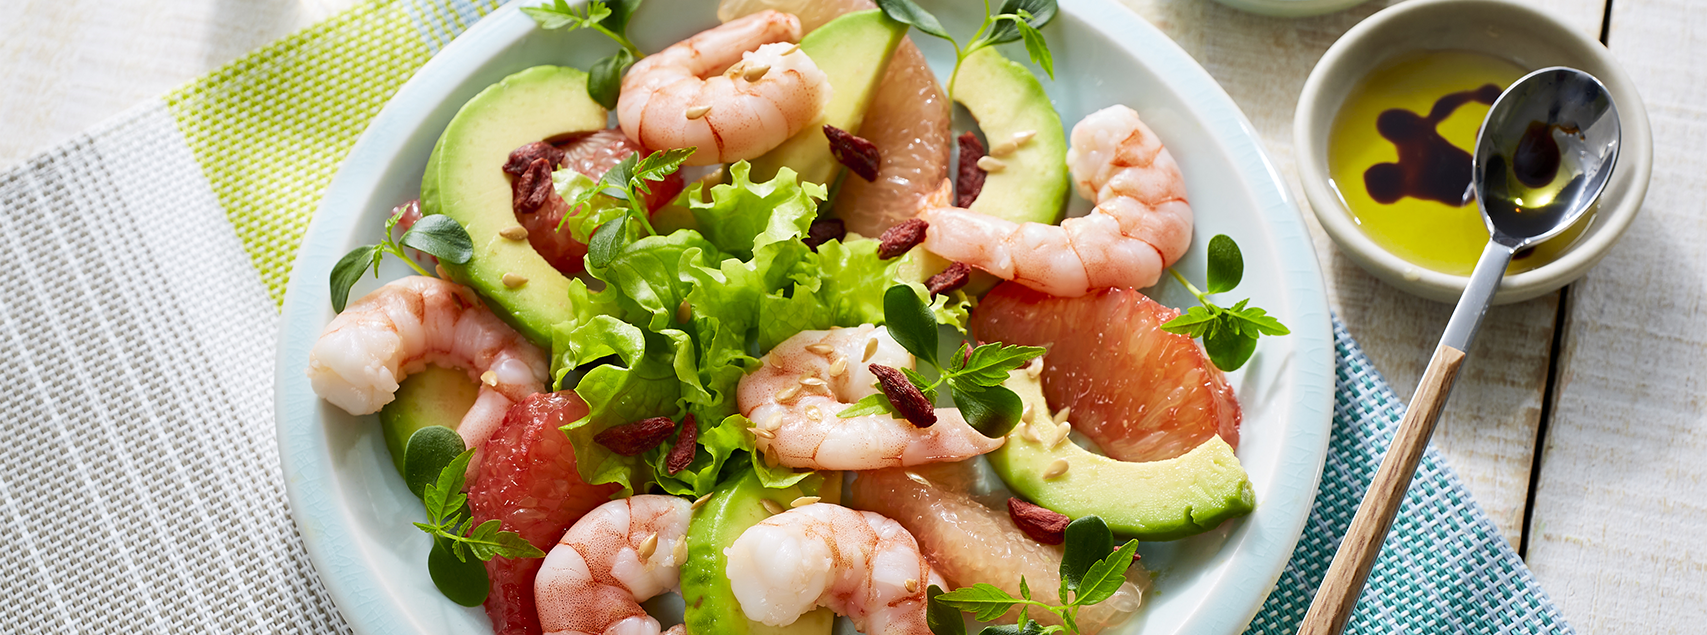 Vitamin-Booster Garnelen-Salat